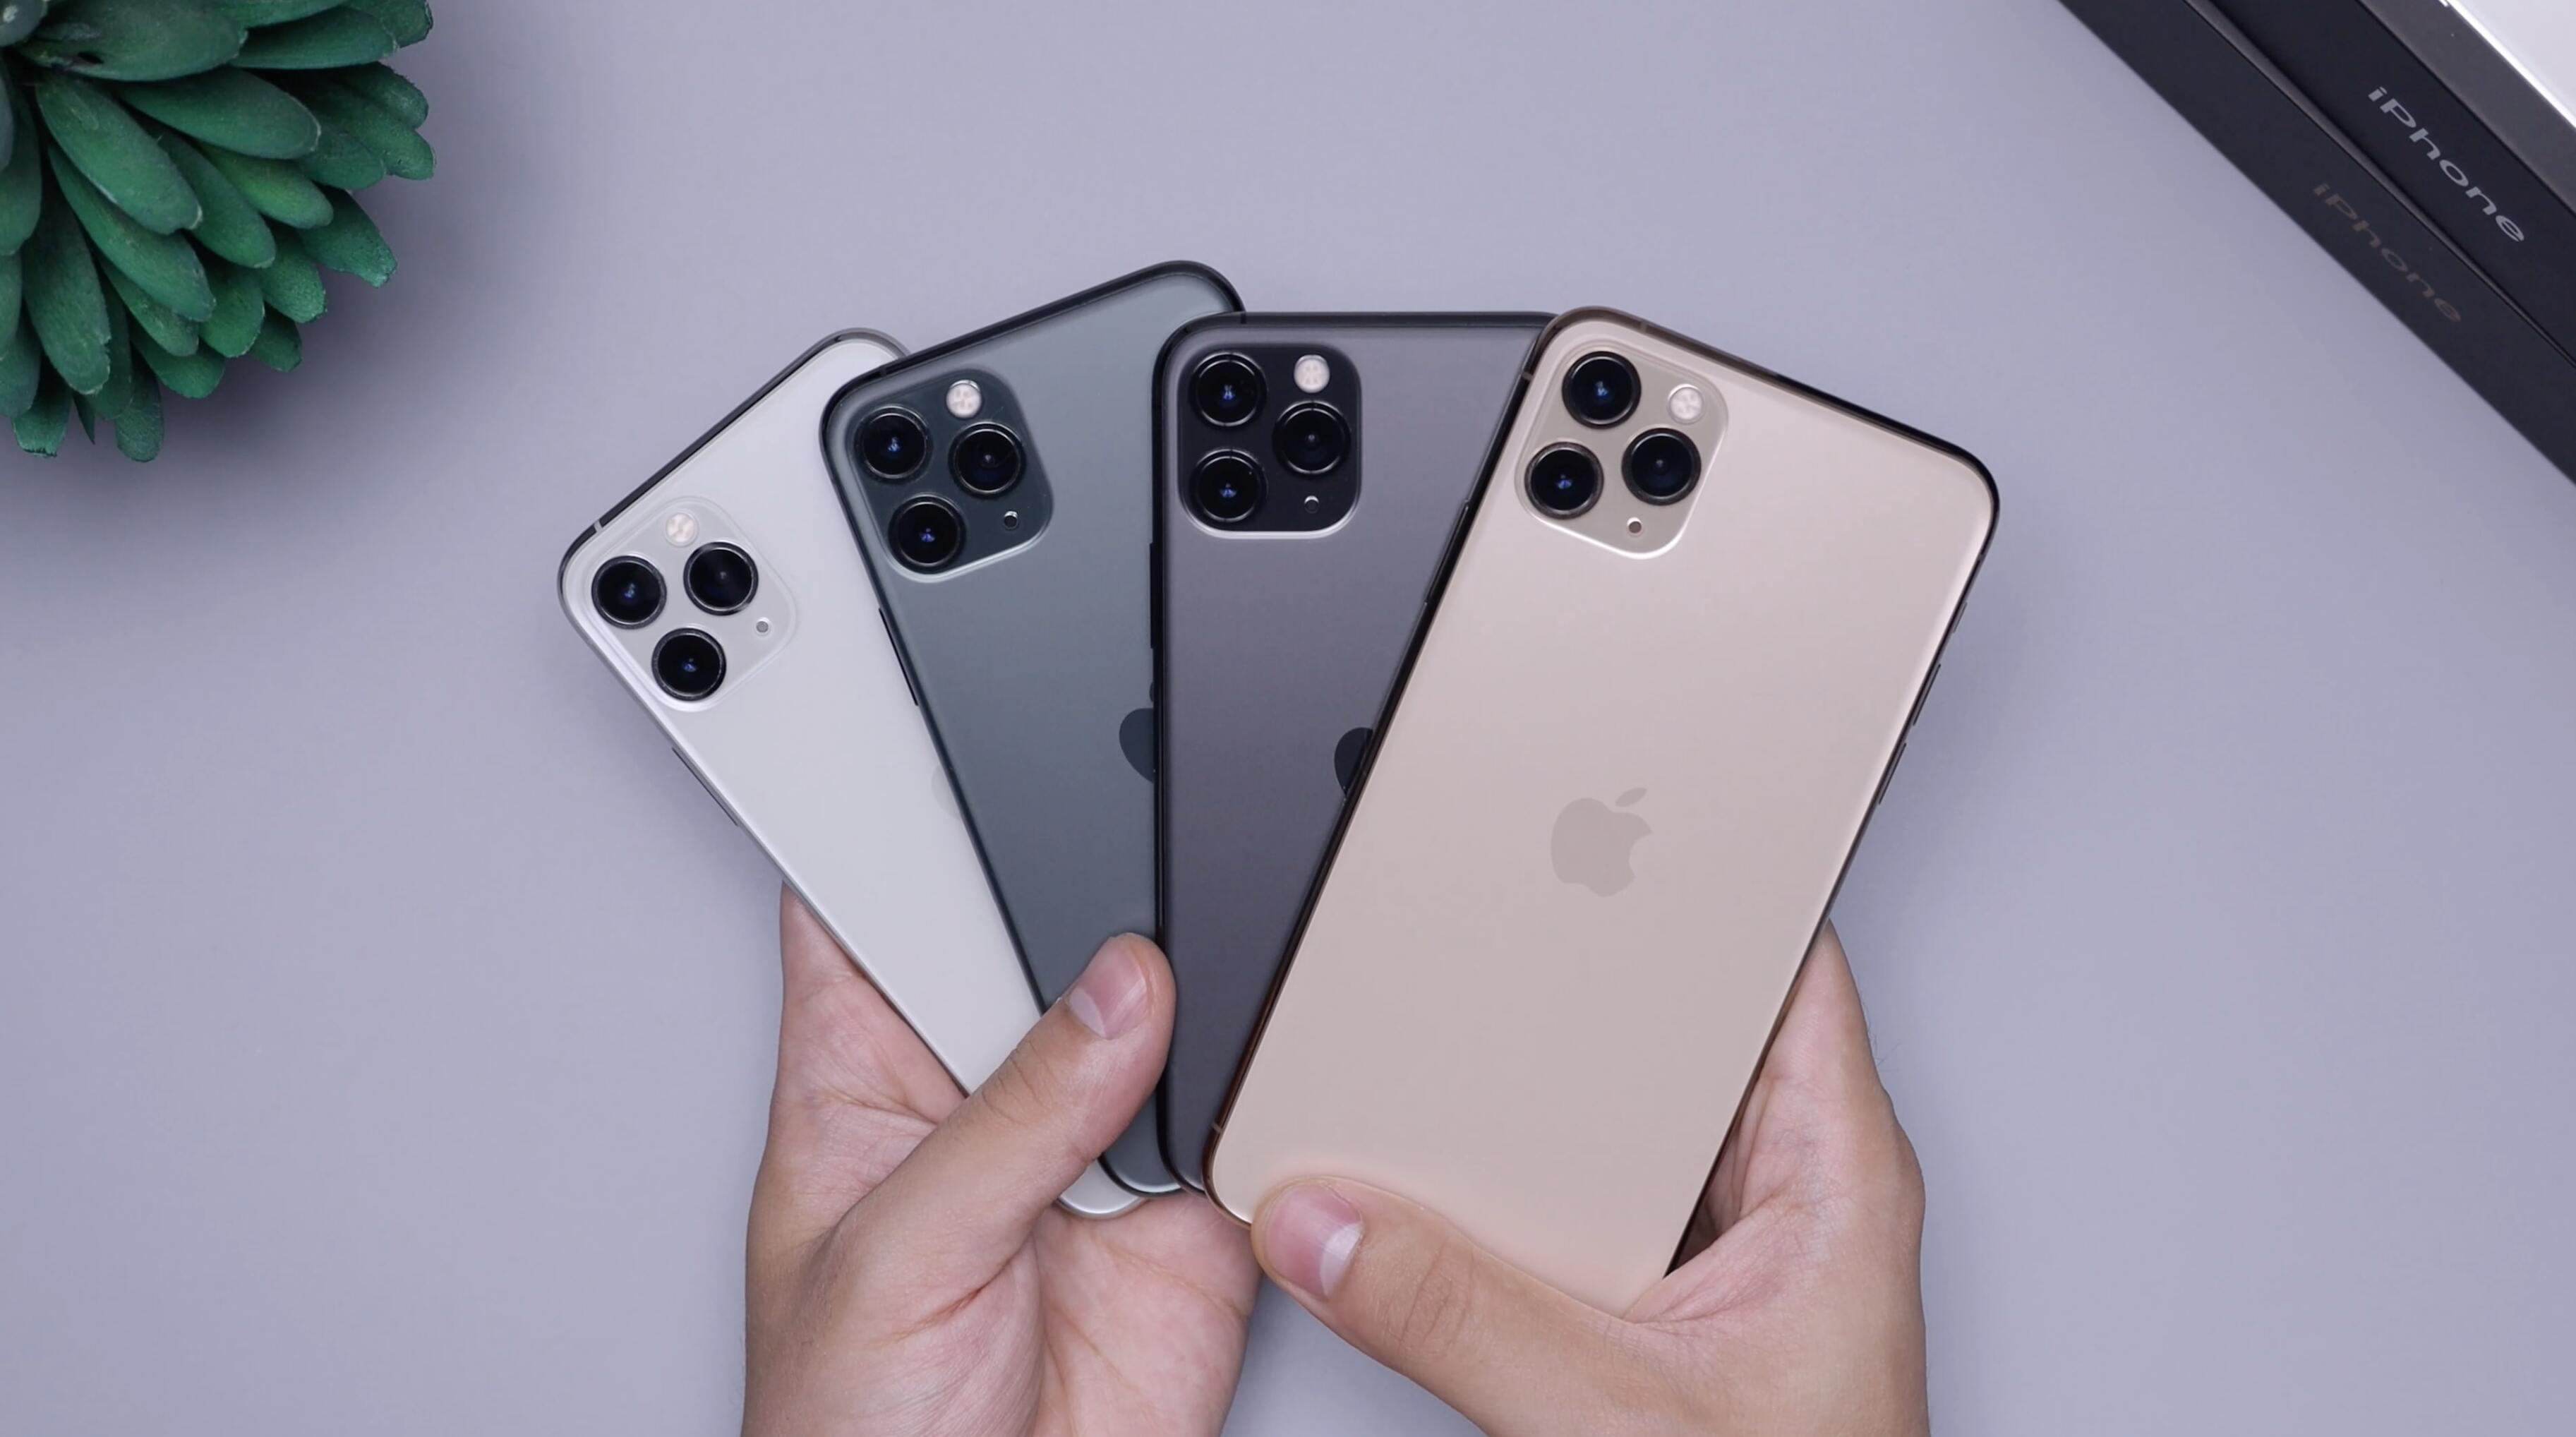 Все iPhone оказались под угрозой отключения Wi-Fi из-за критической ошибки